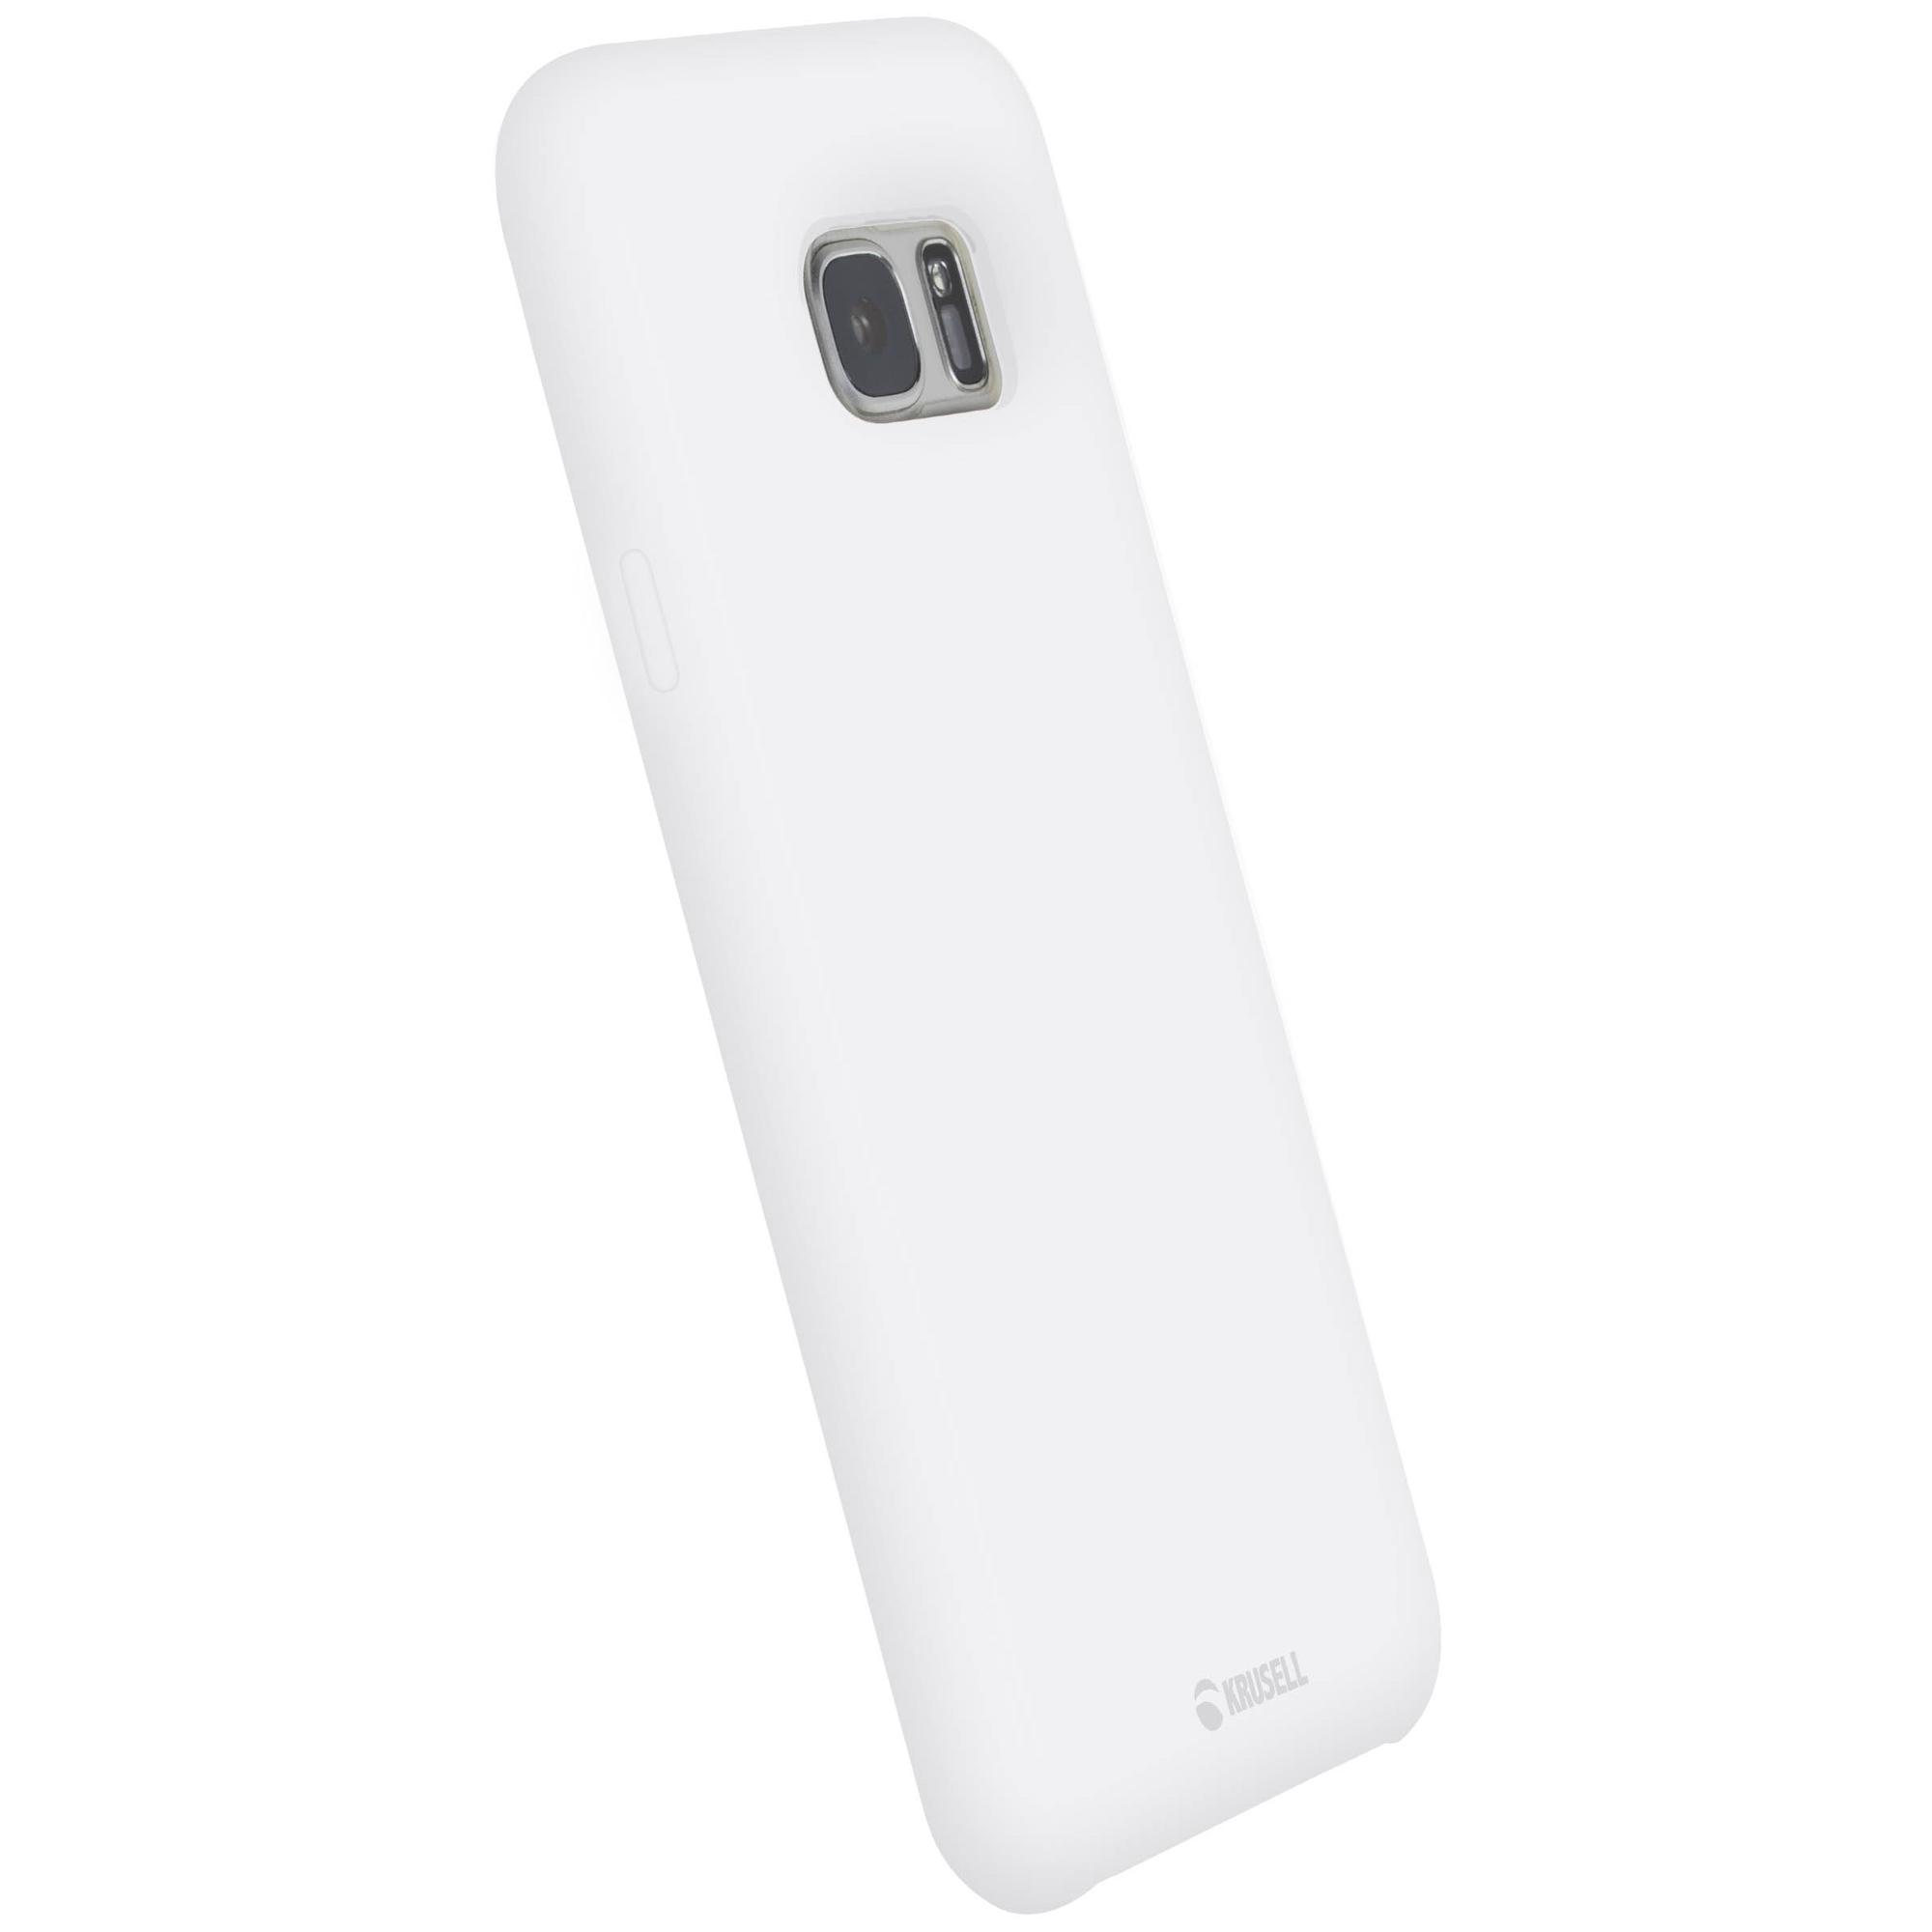 Krusell Bello Cover Samsung Galaxy S8 - White